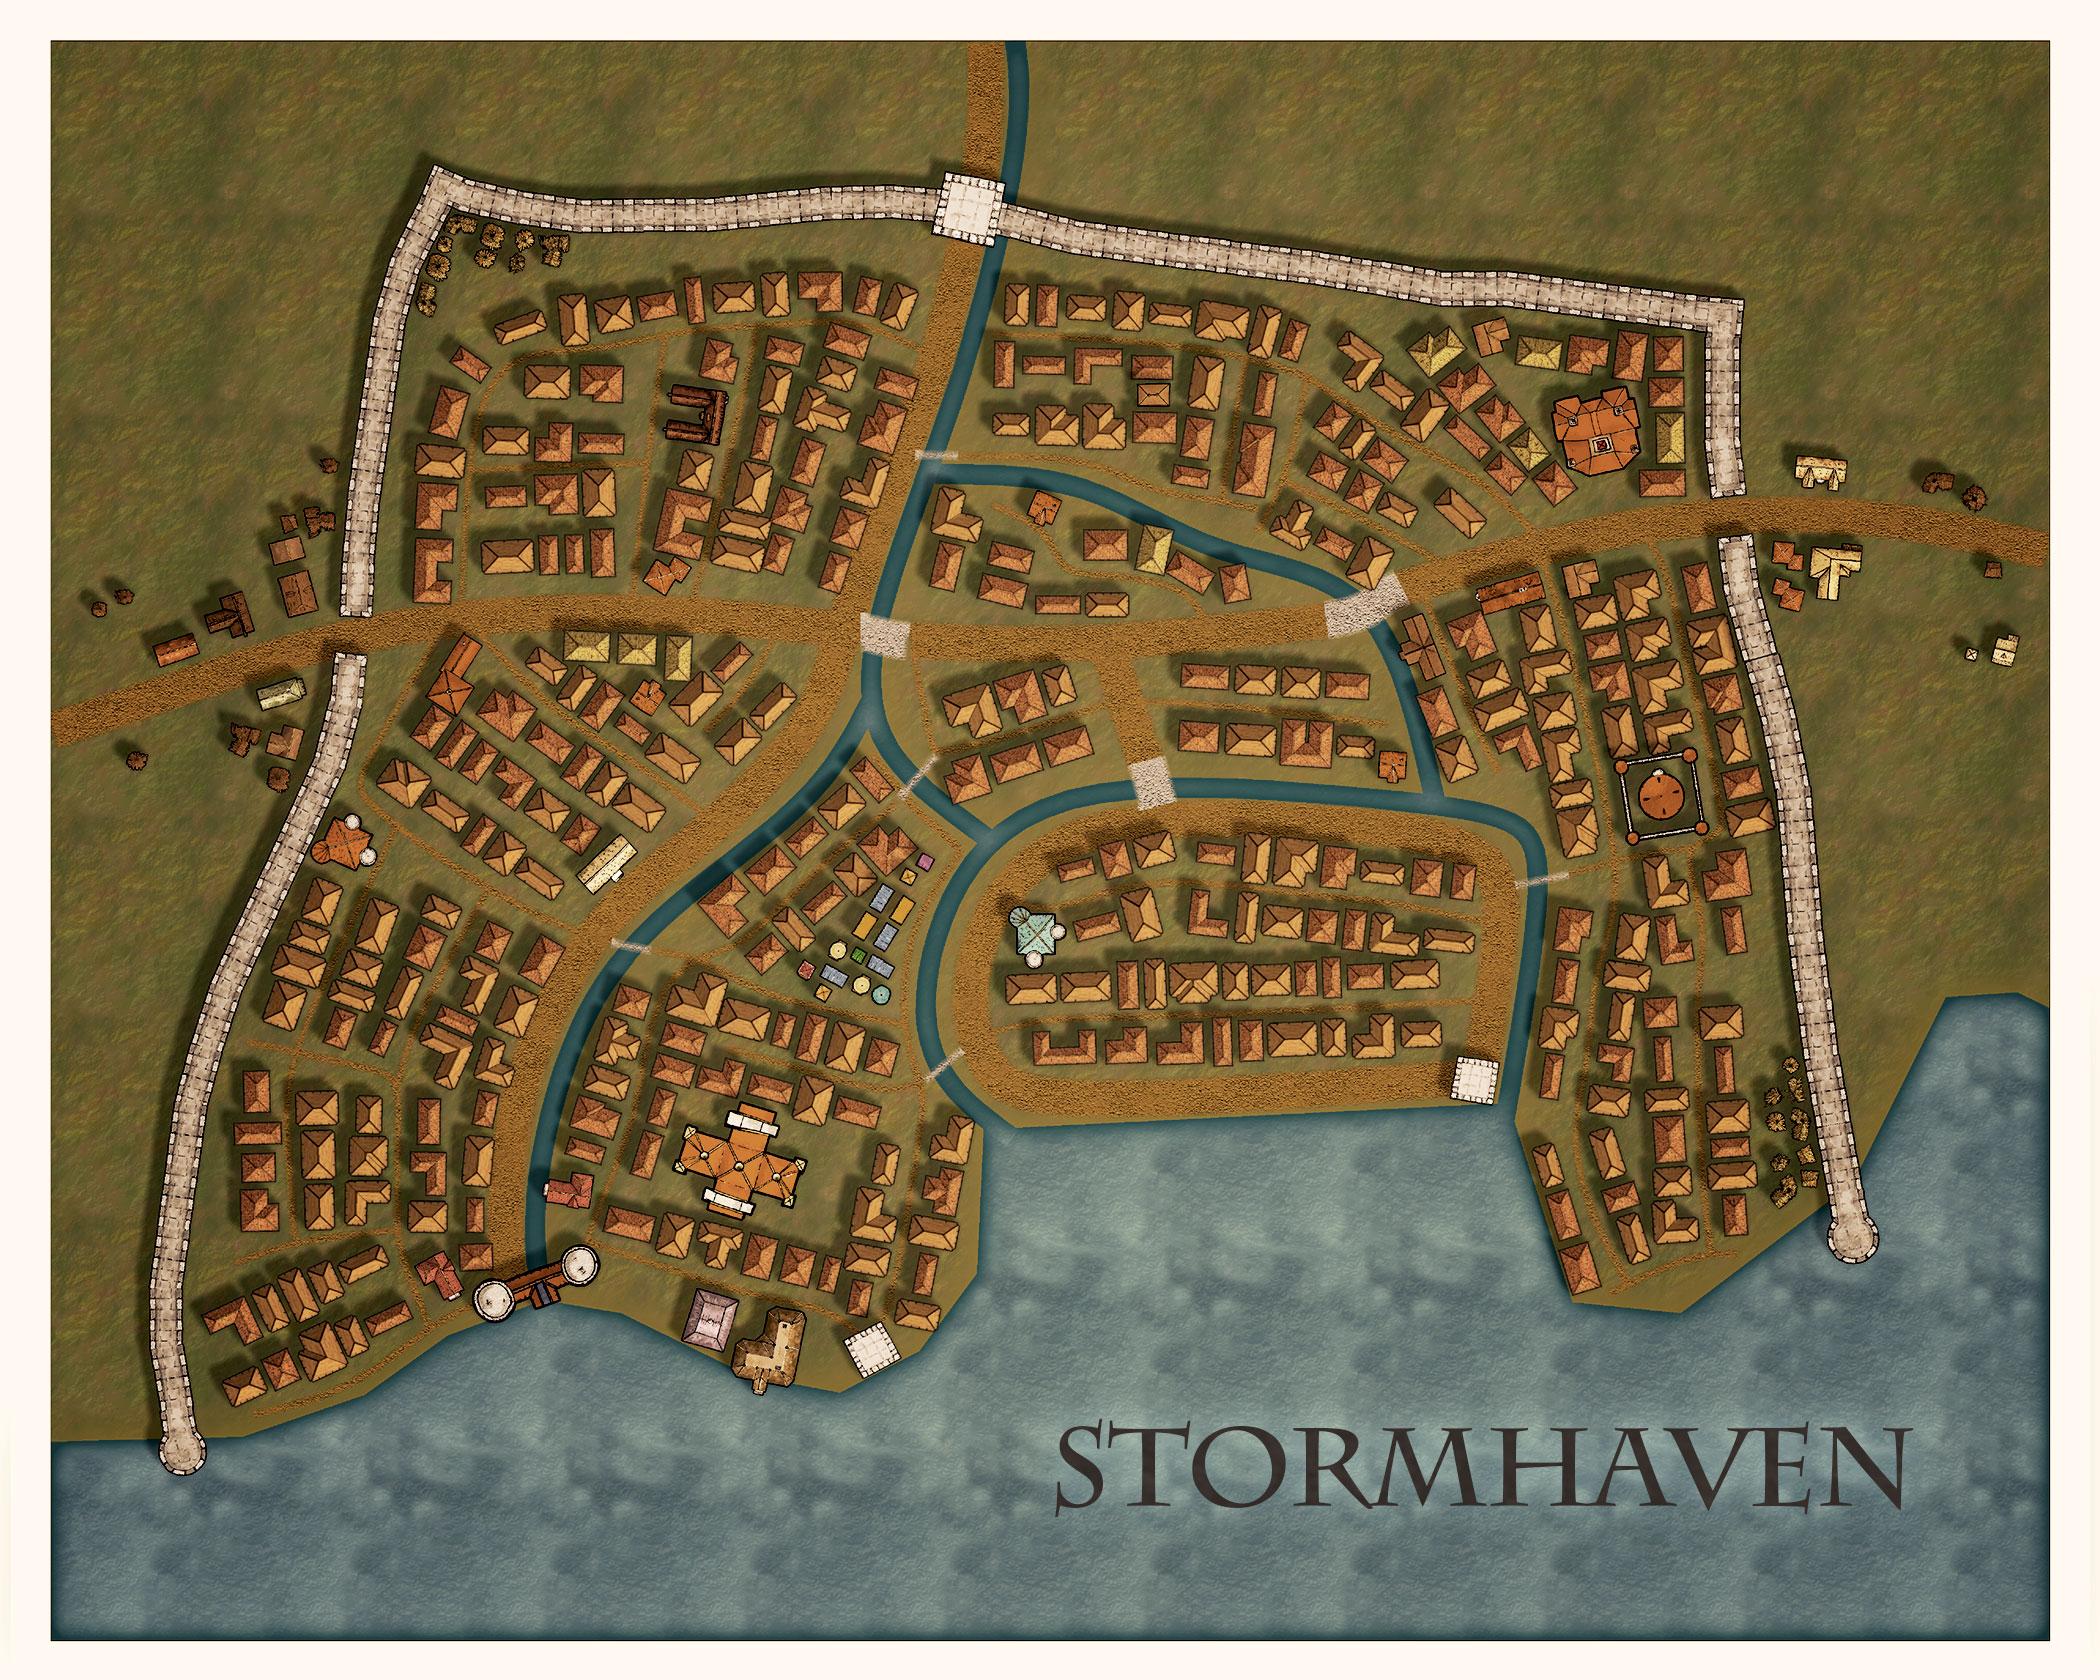 stormhaven_web.jpg